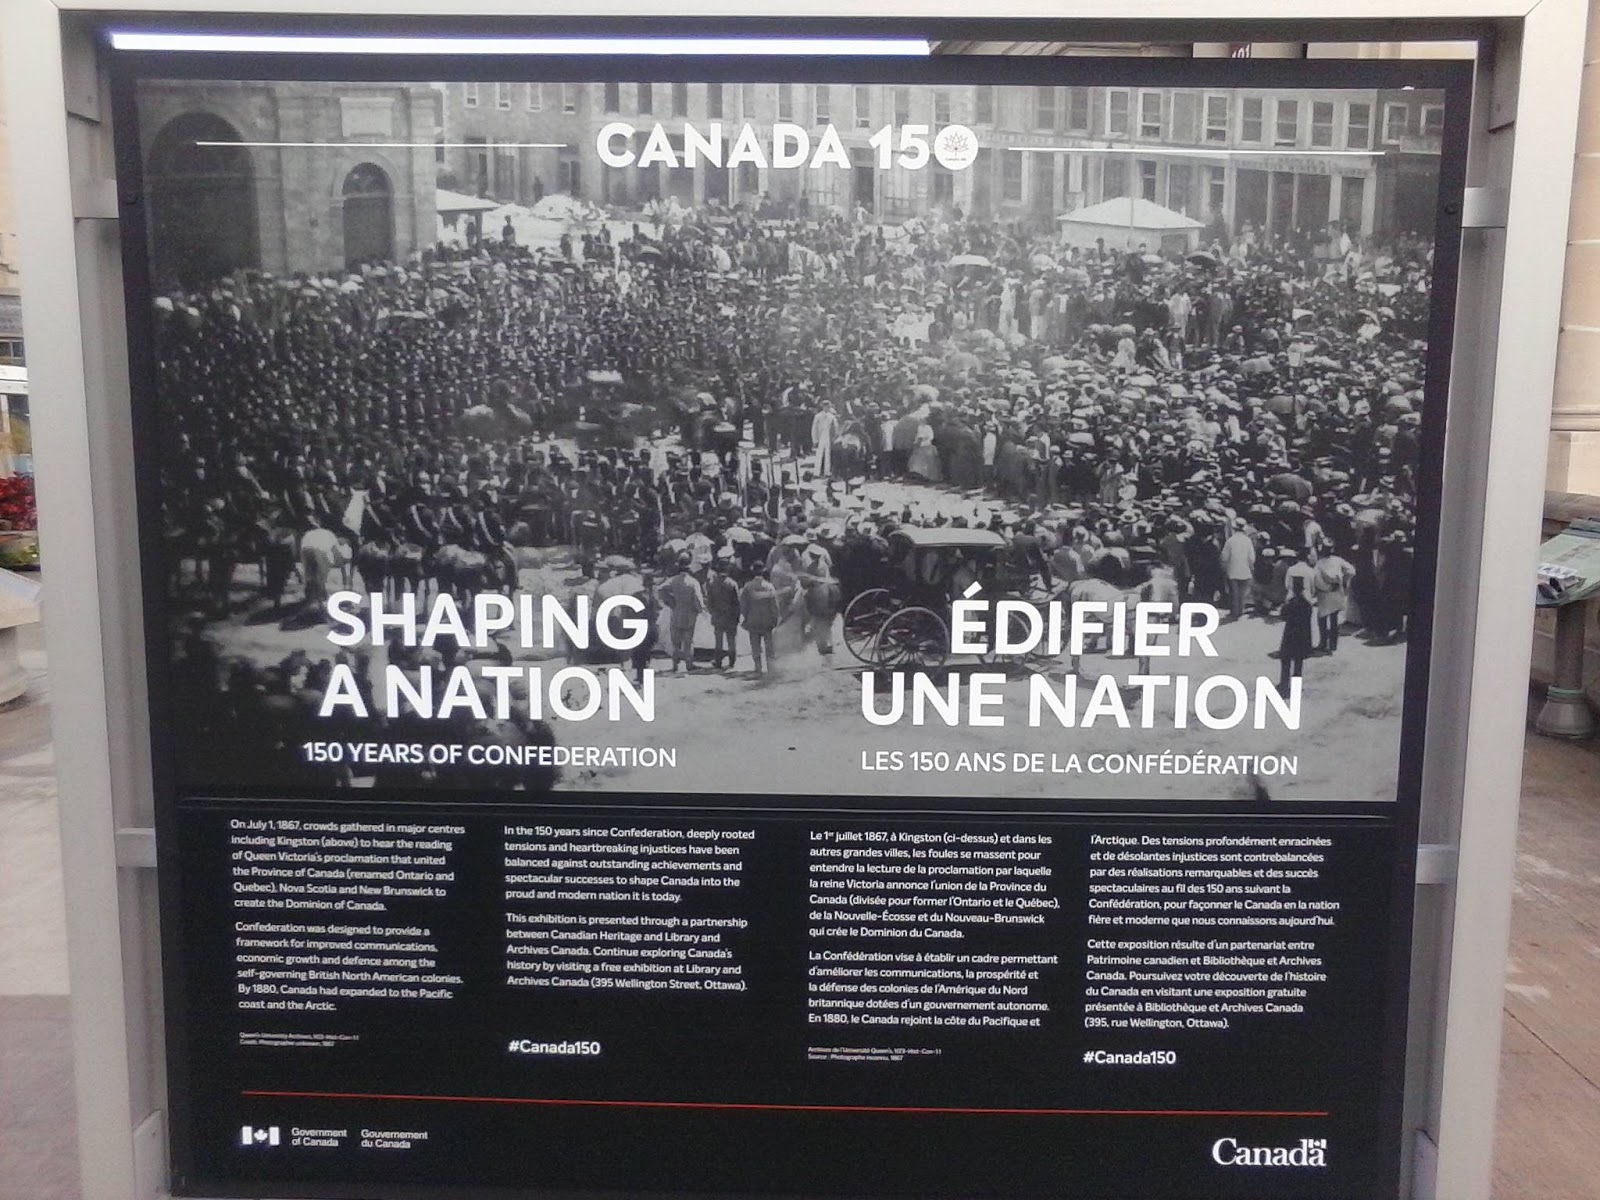 Ottawa Daily Photo: Creating The National History